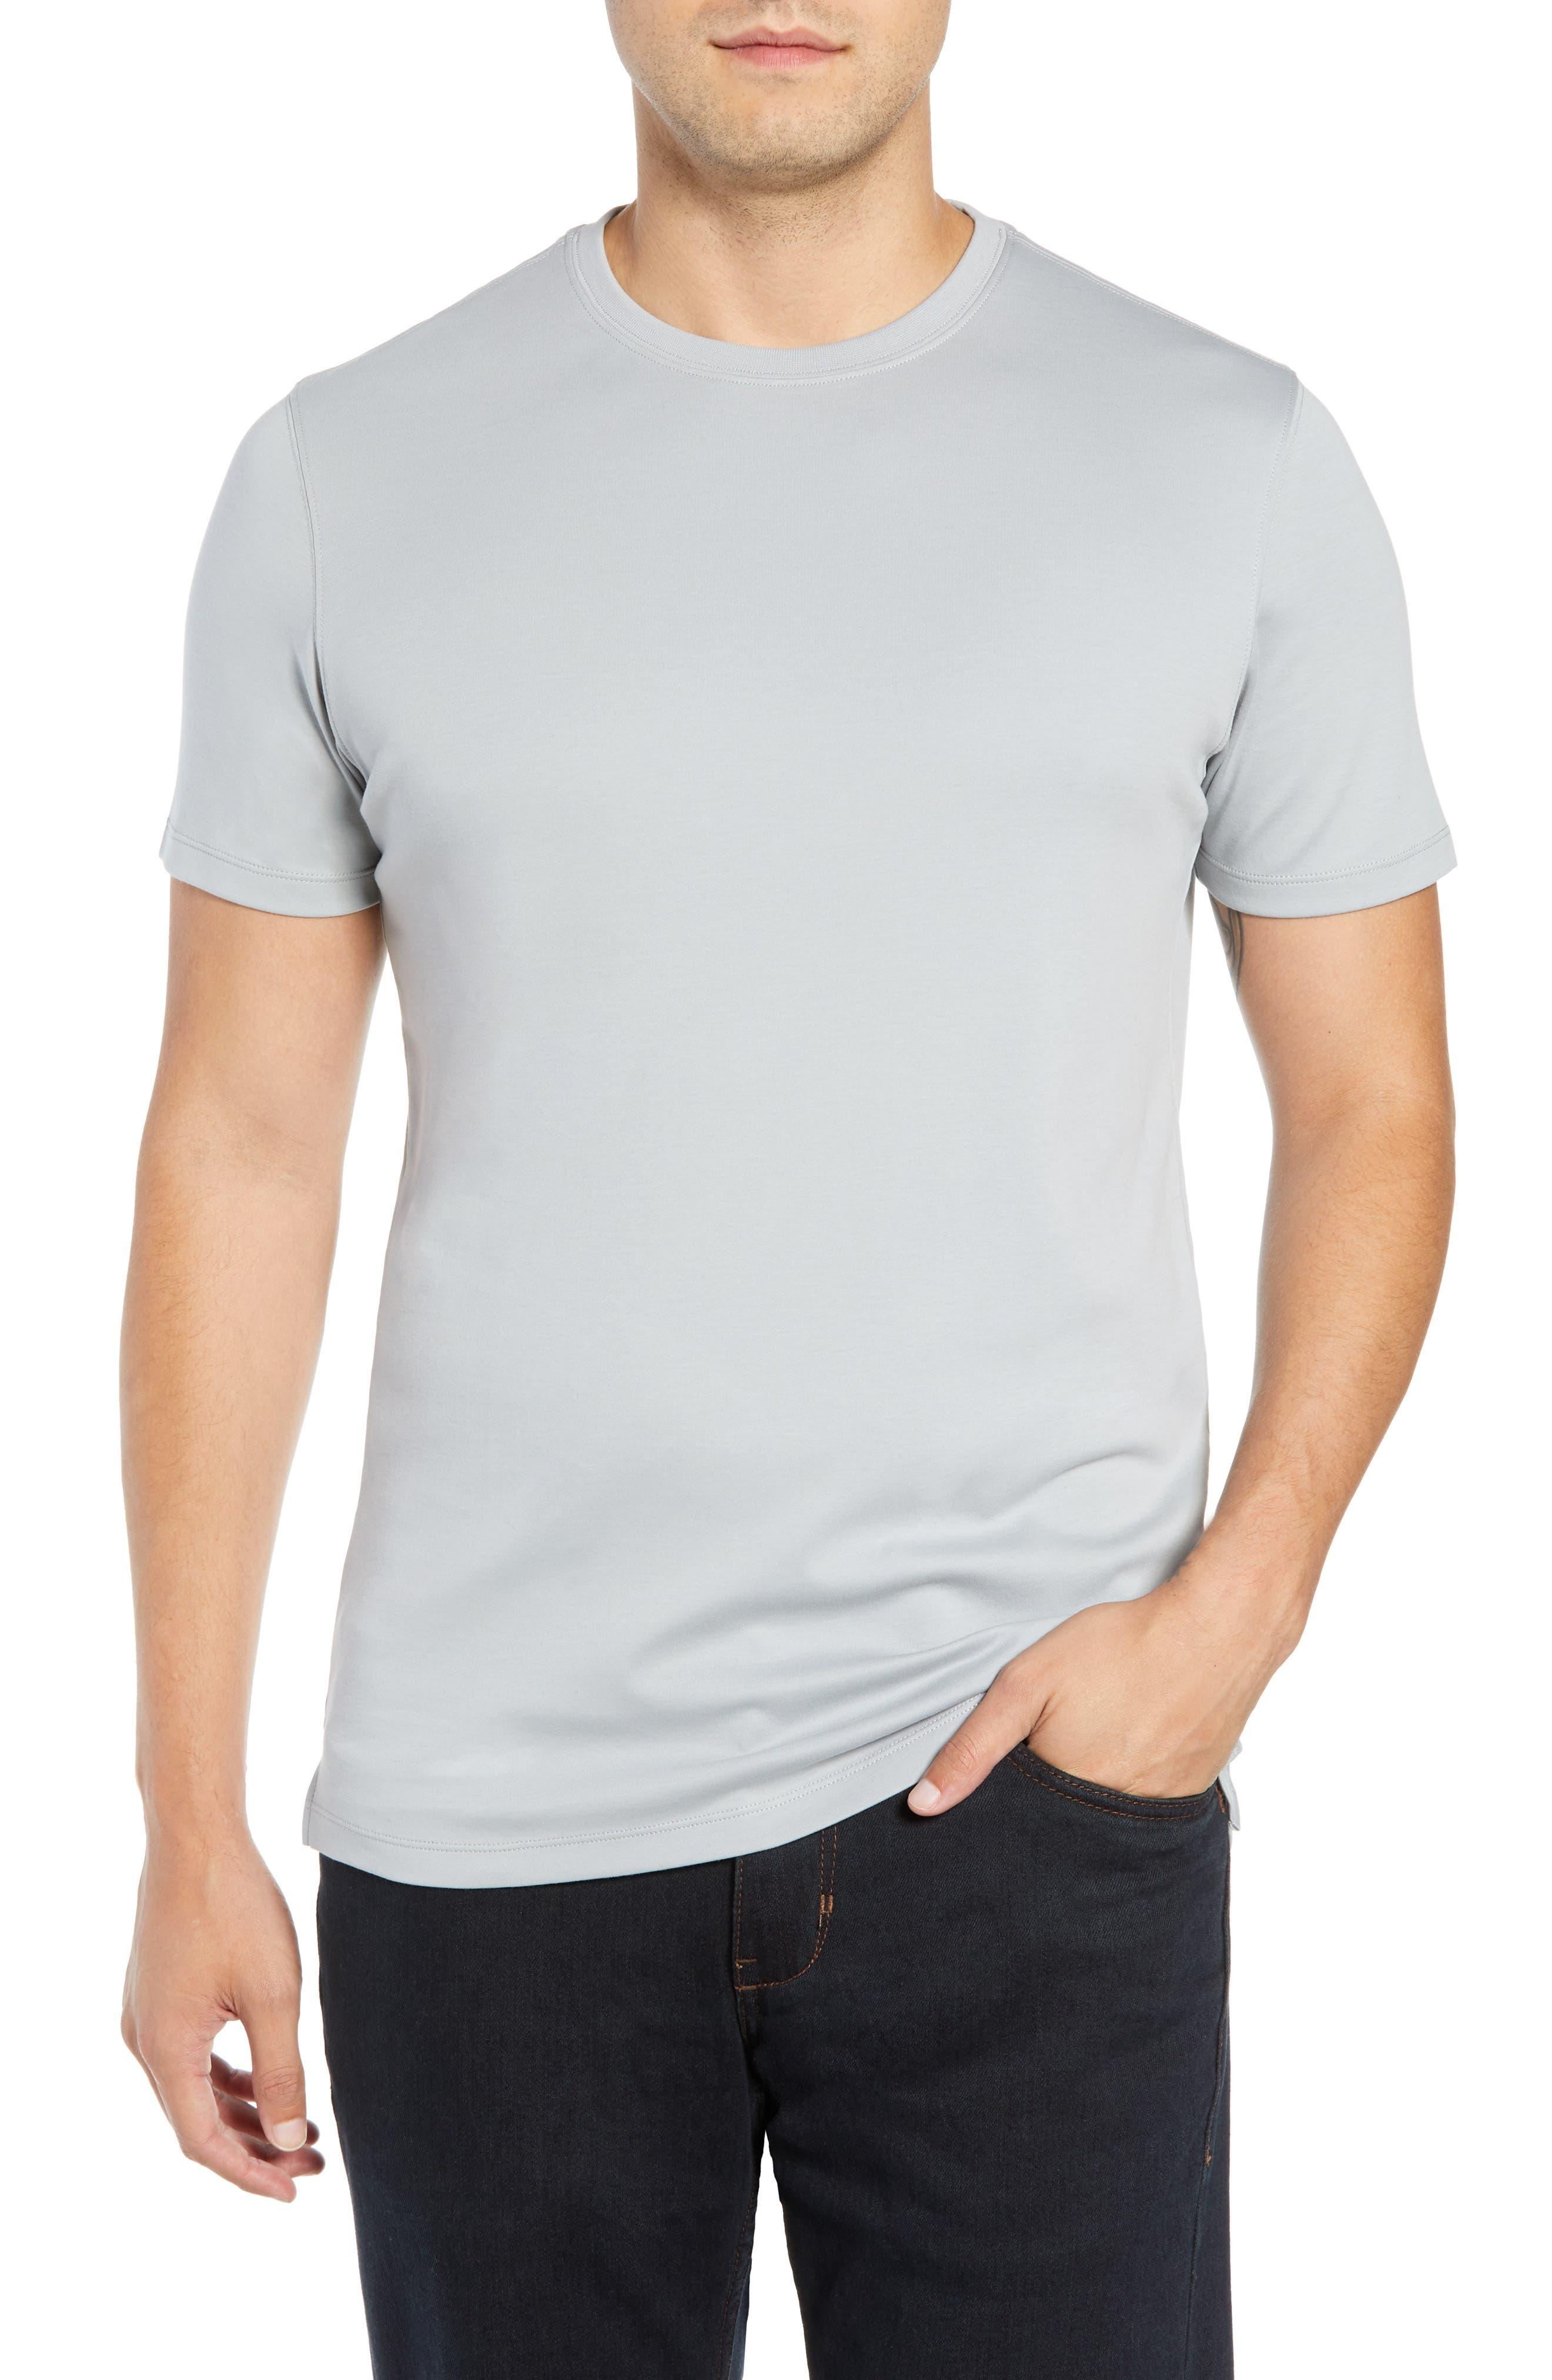 ROBERT BARAKETT 'Georgia' Crewneck T-Shirt, Main, color, MOON DUST